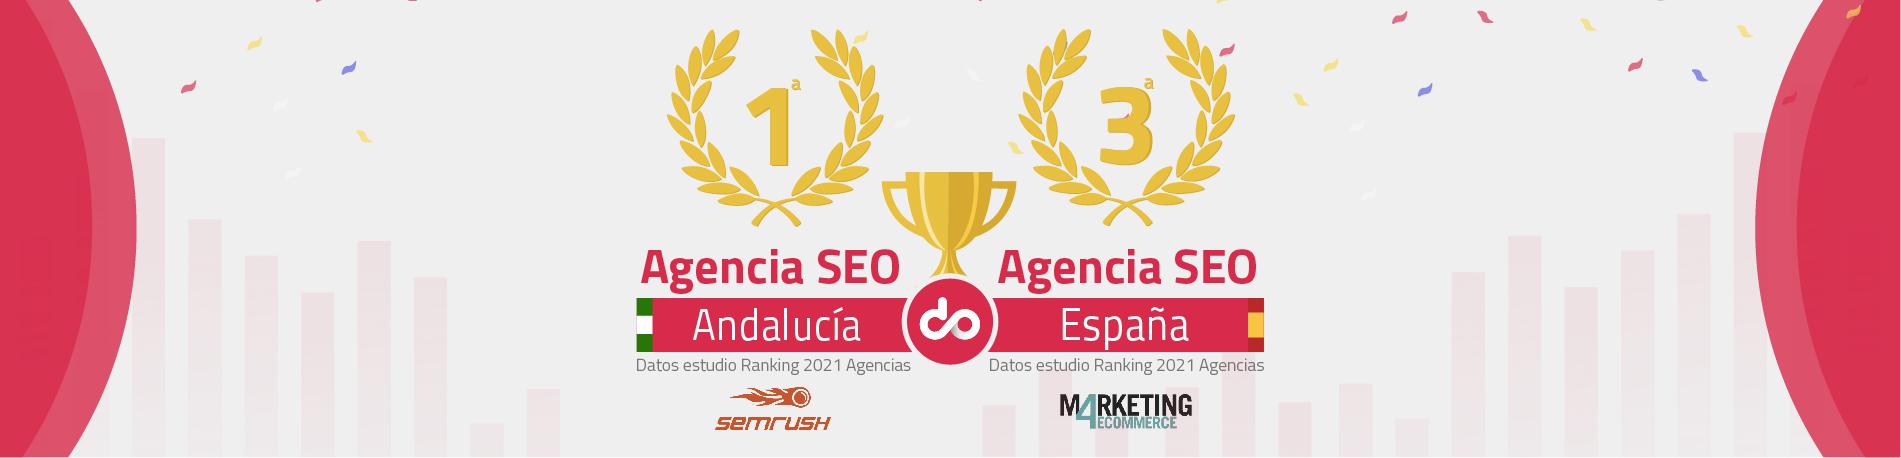 Agencia SEO Madrid